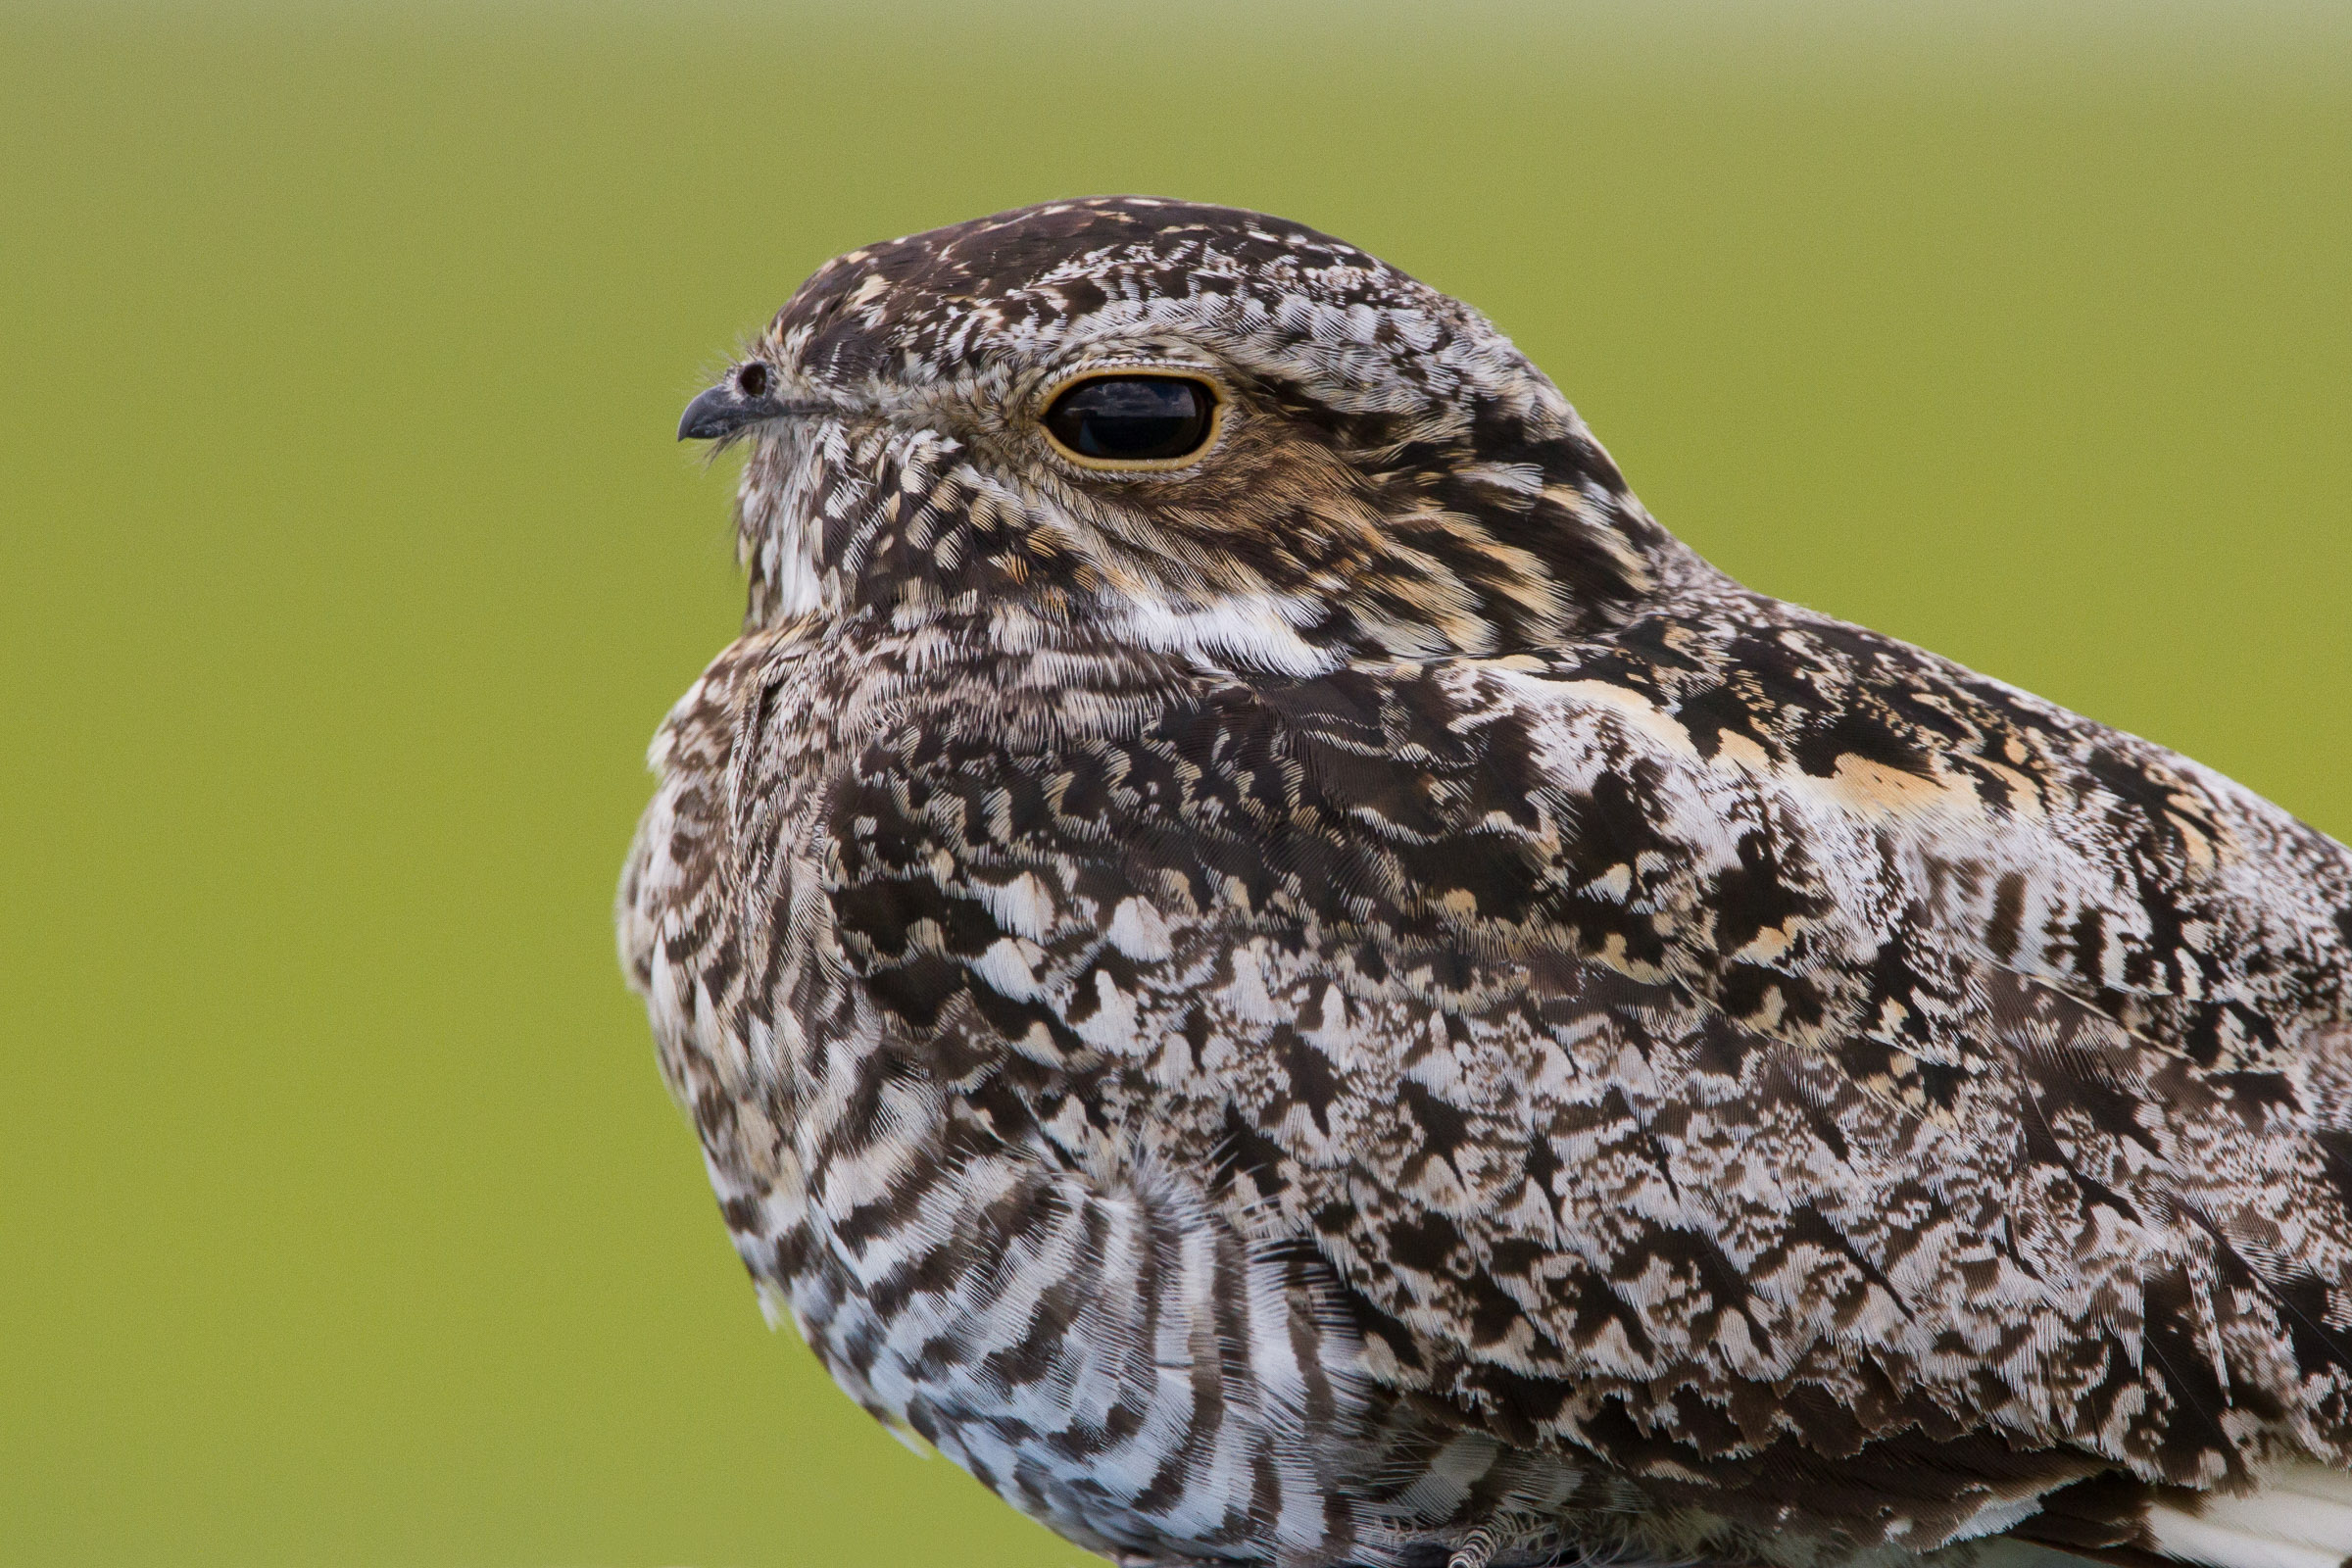 Nightjars - a guide to nightjars and related nightbirds